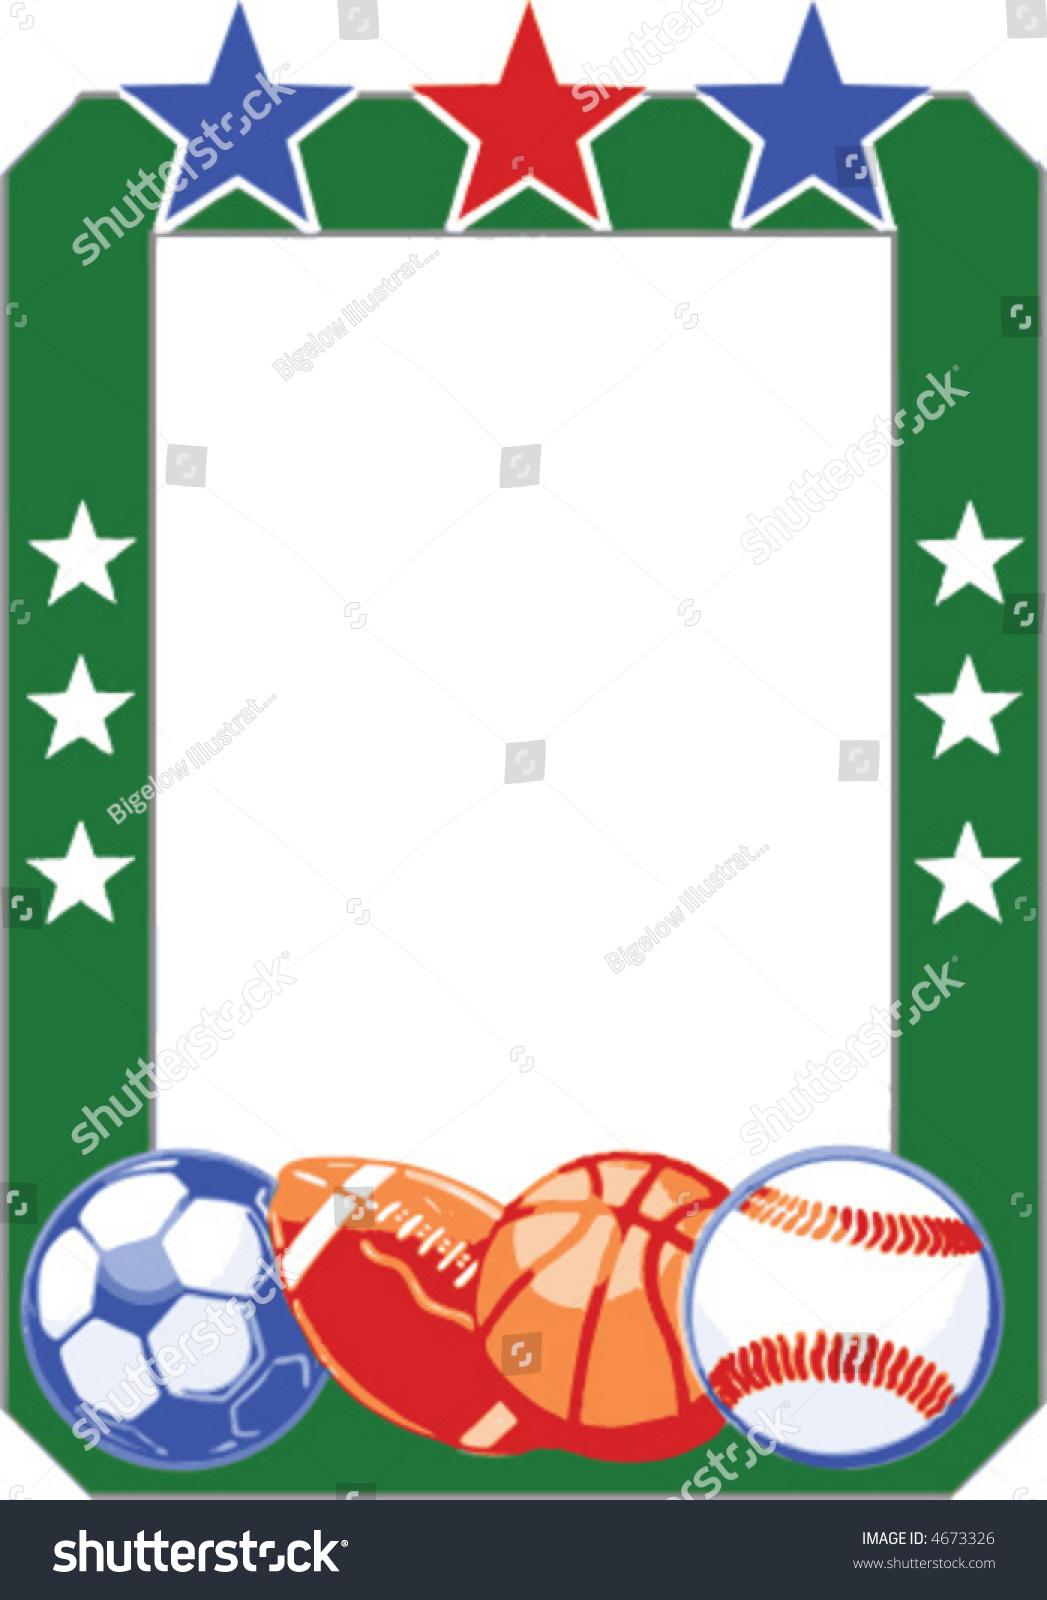 Sports frame soccer football basketball baseball stock vector sports frame with soccer football basketball and baseball jeuxipadfo Images